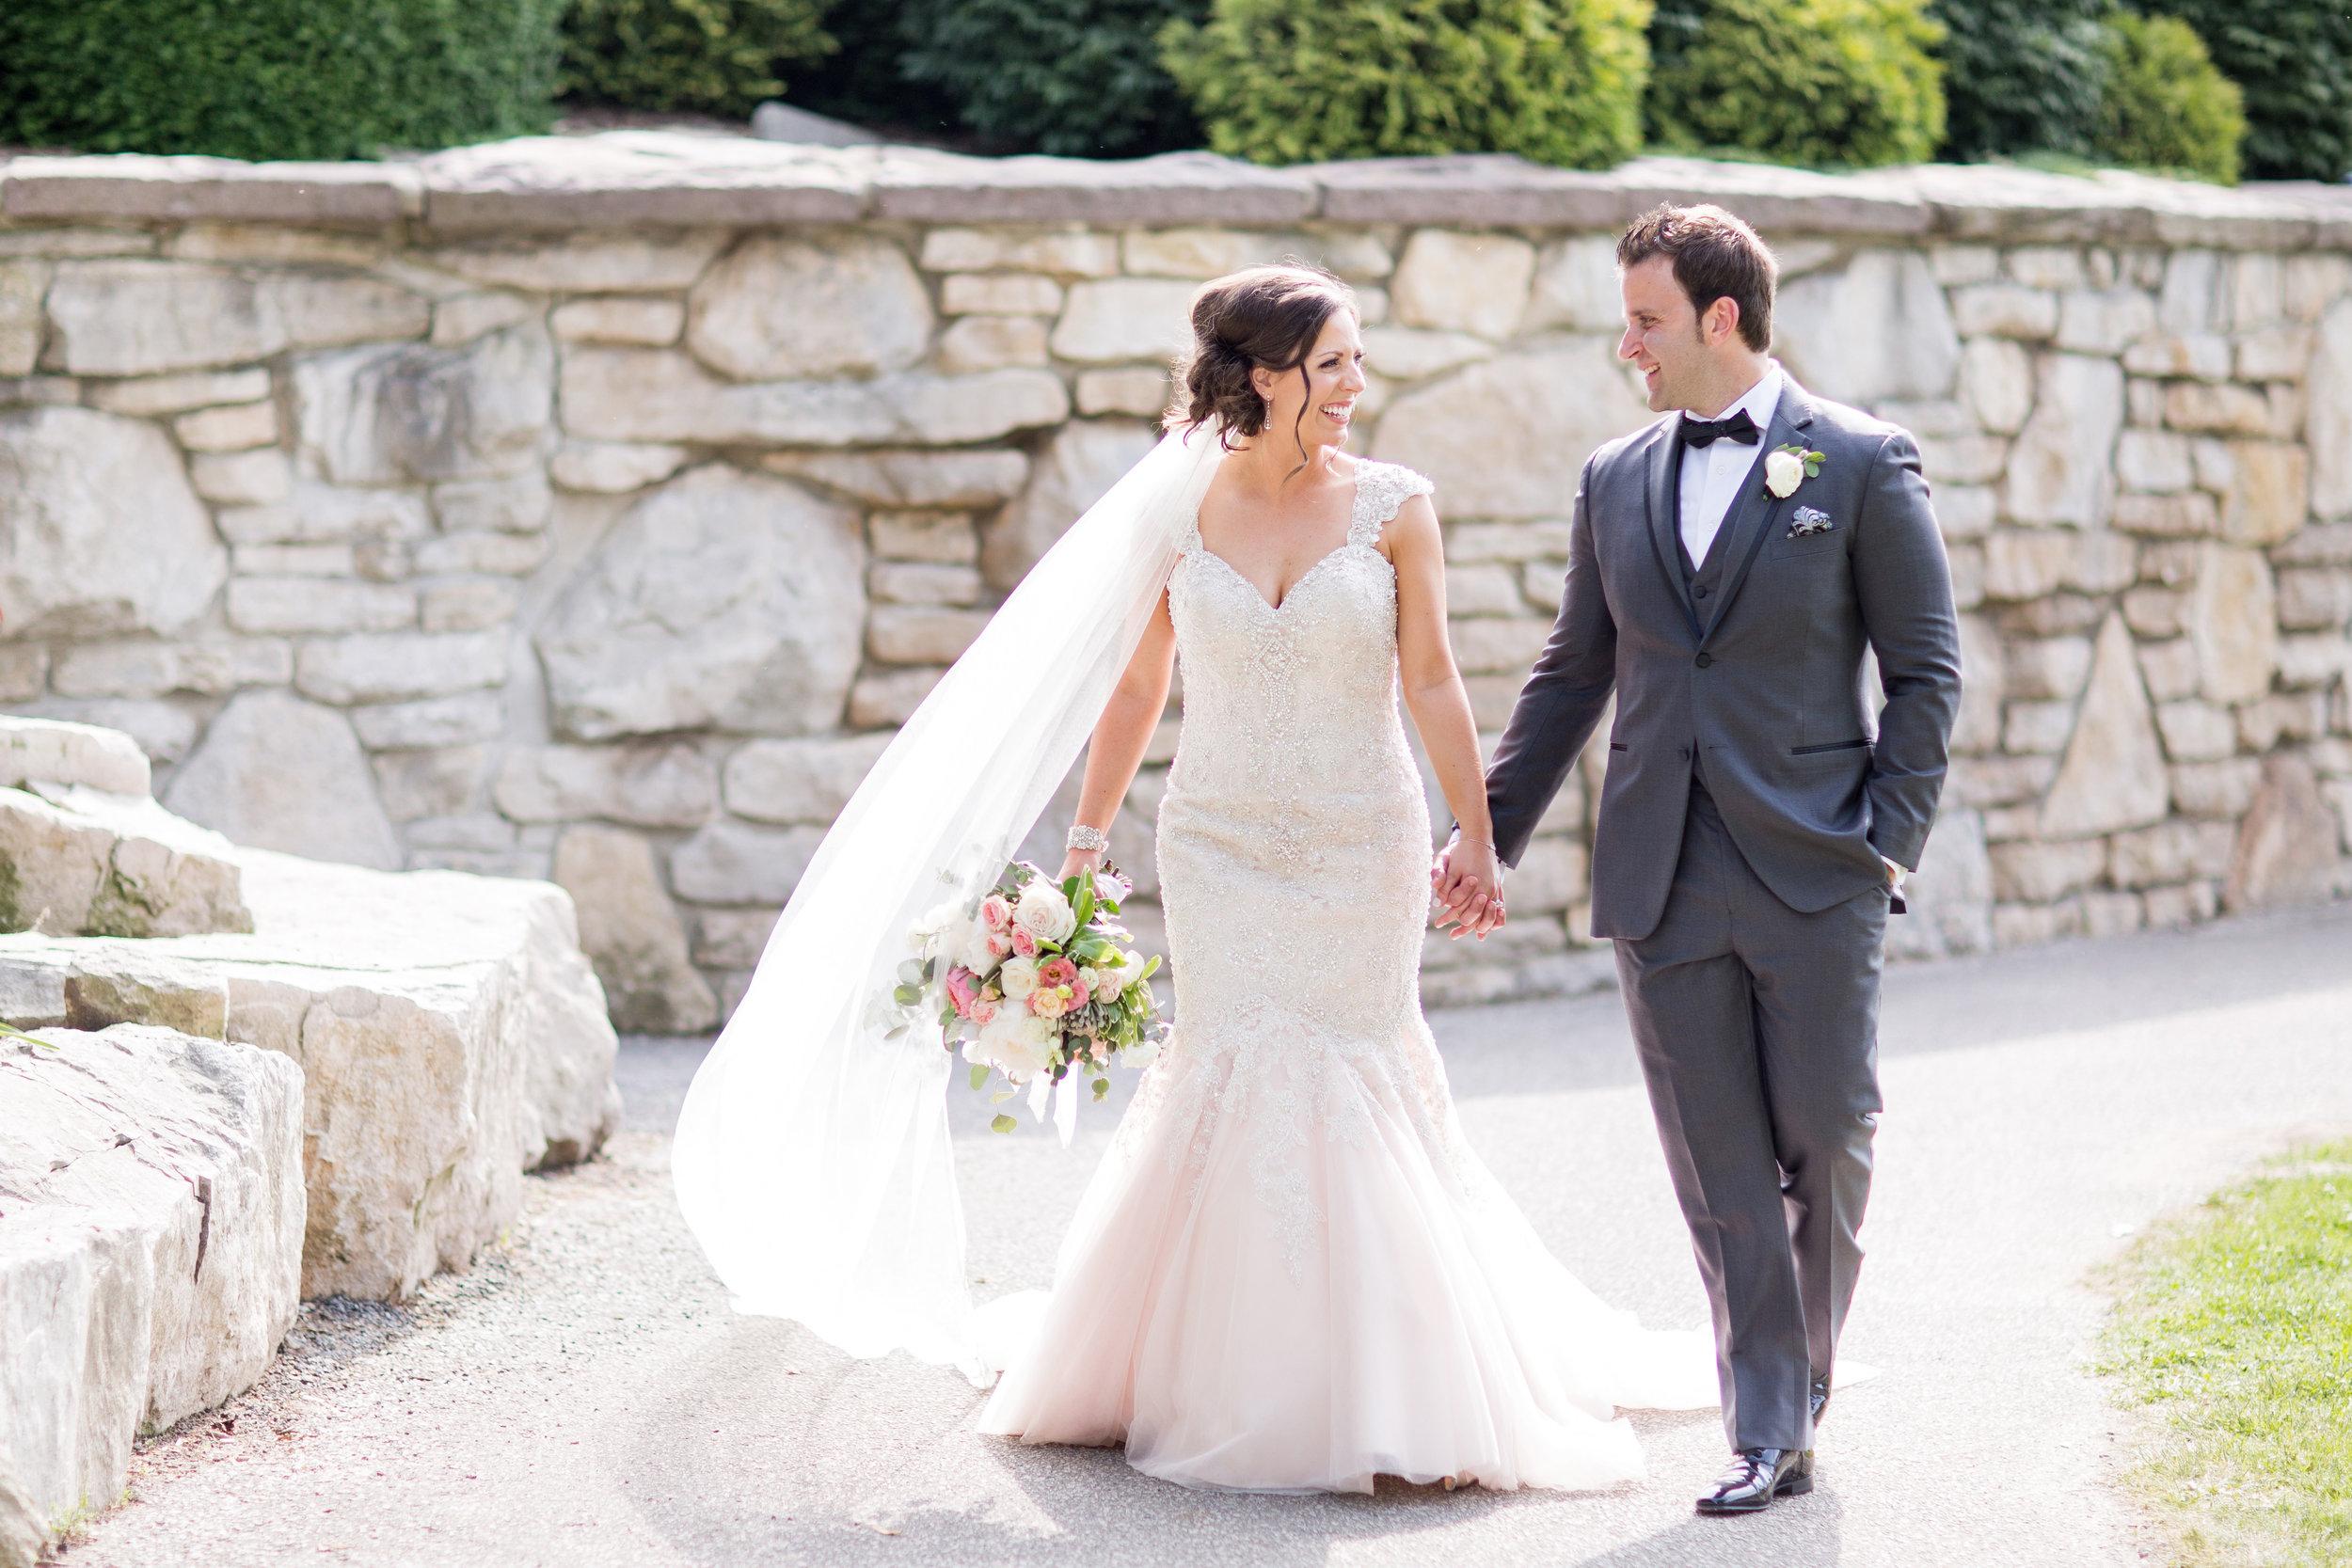 stylish-wedding-photography-windsor-toronto-ontario-wedding-photographer-winery-eryn-shea-photography-22.jpg